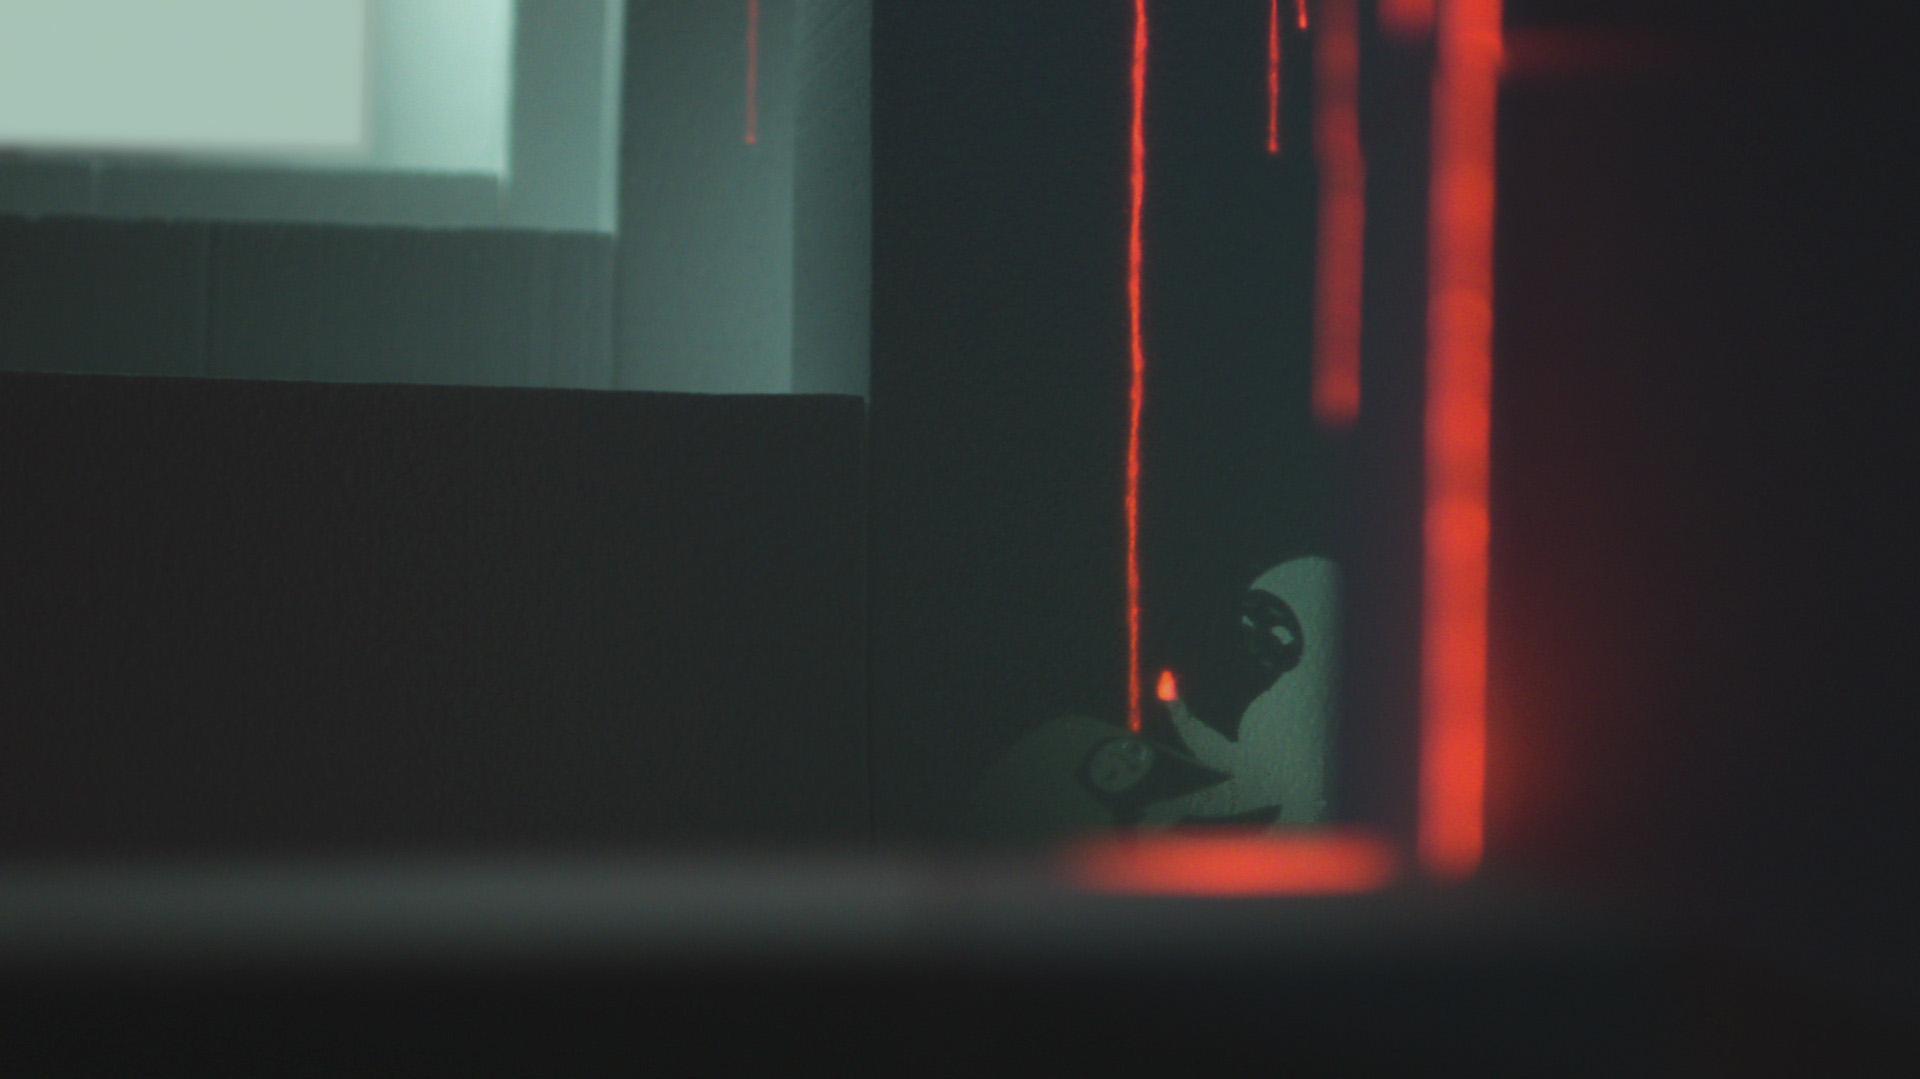 Blue Zoo's Multi-Award Winning Experimental Short 'Mamoon' Premieres Online